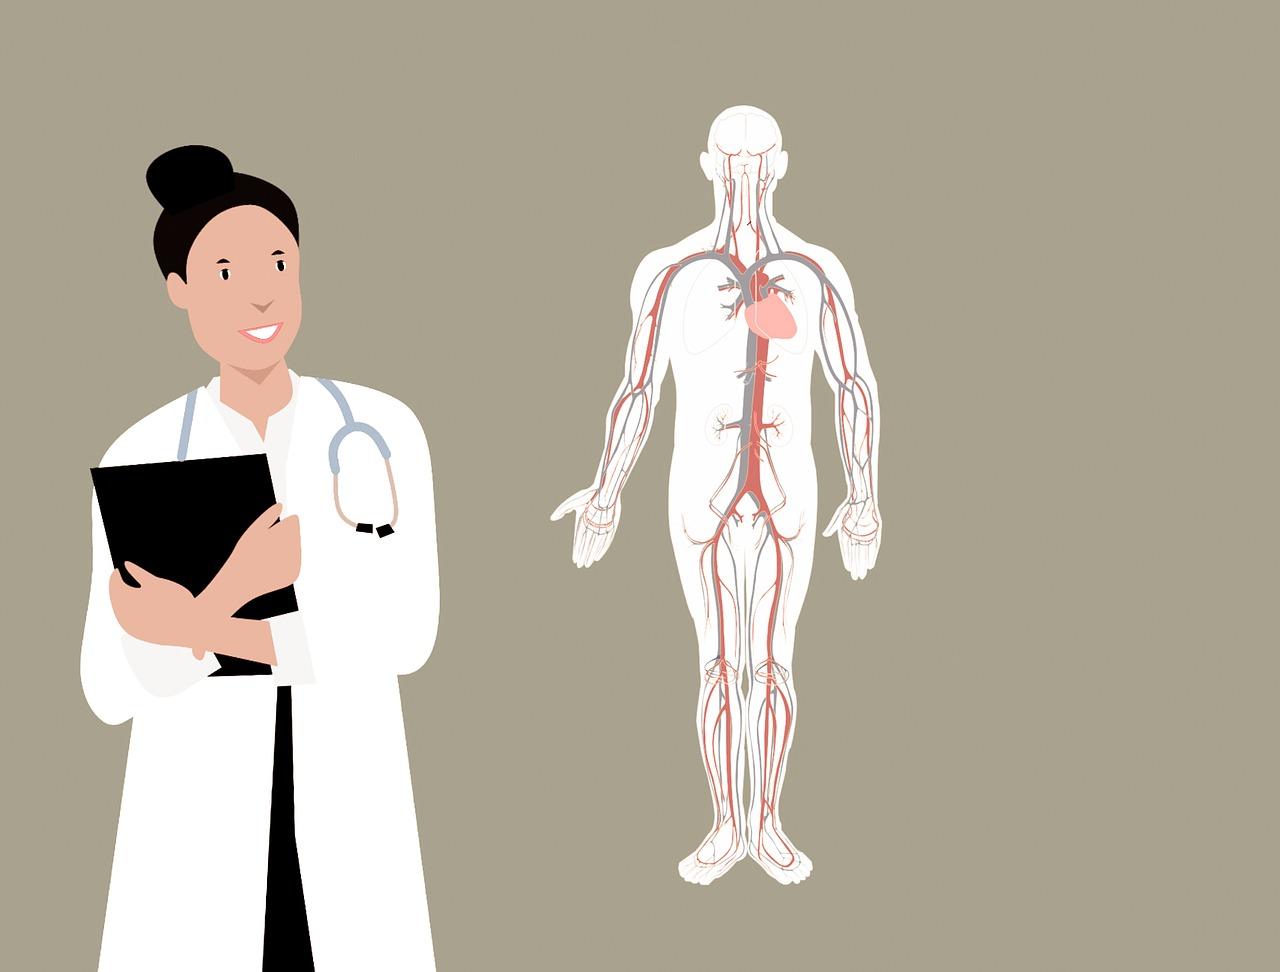 Cancer: The Main Culprit Behind Superior Vena Cava Syndrome